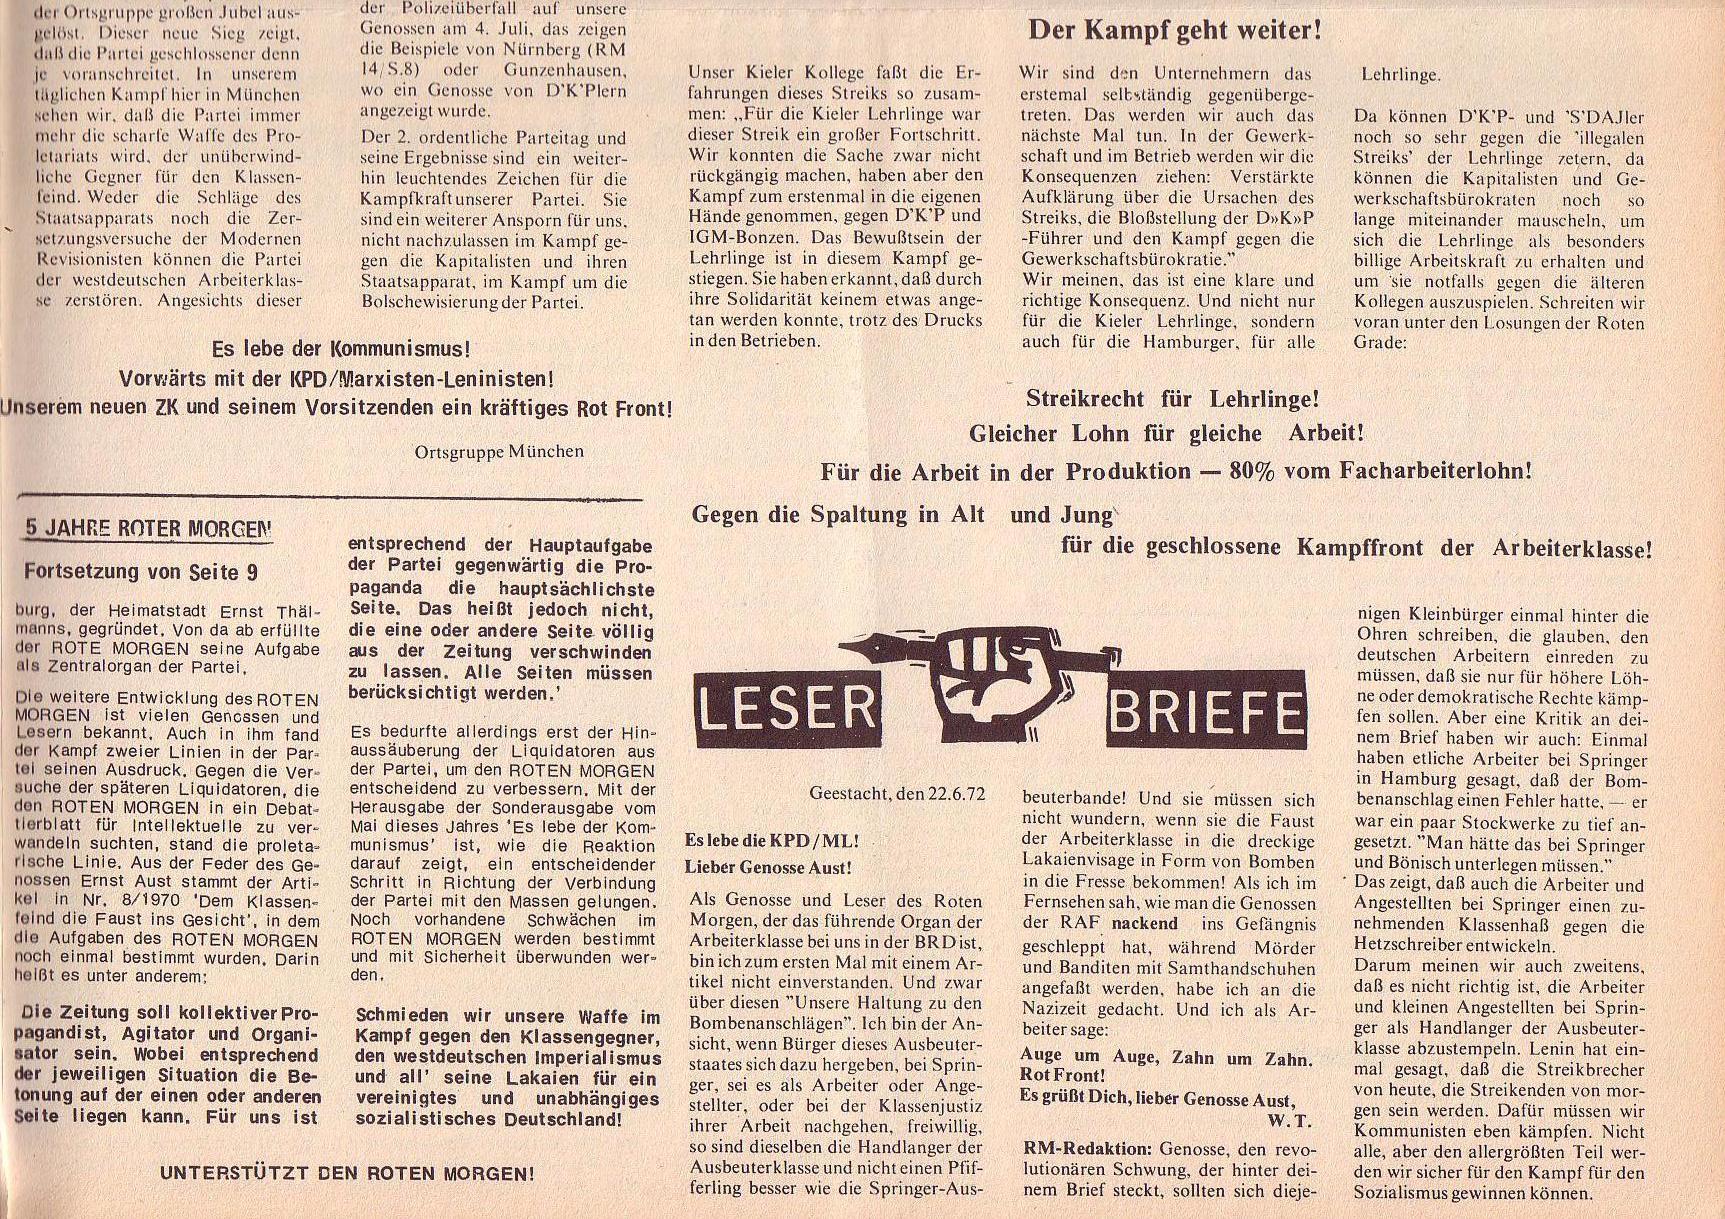 Roter Morgen, 6. Jg., 31. Juli 1972, Nr. 15, Seite 11b